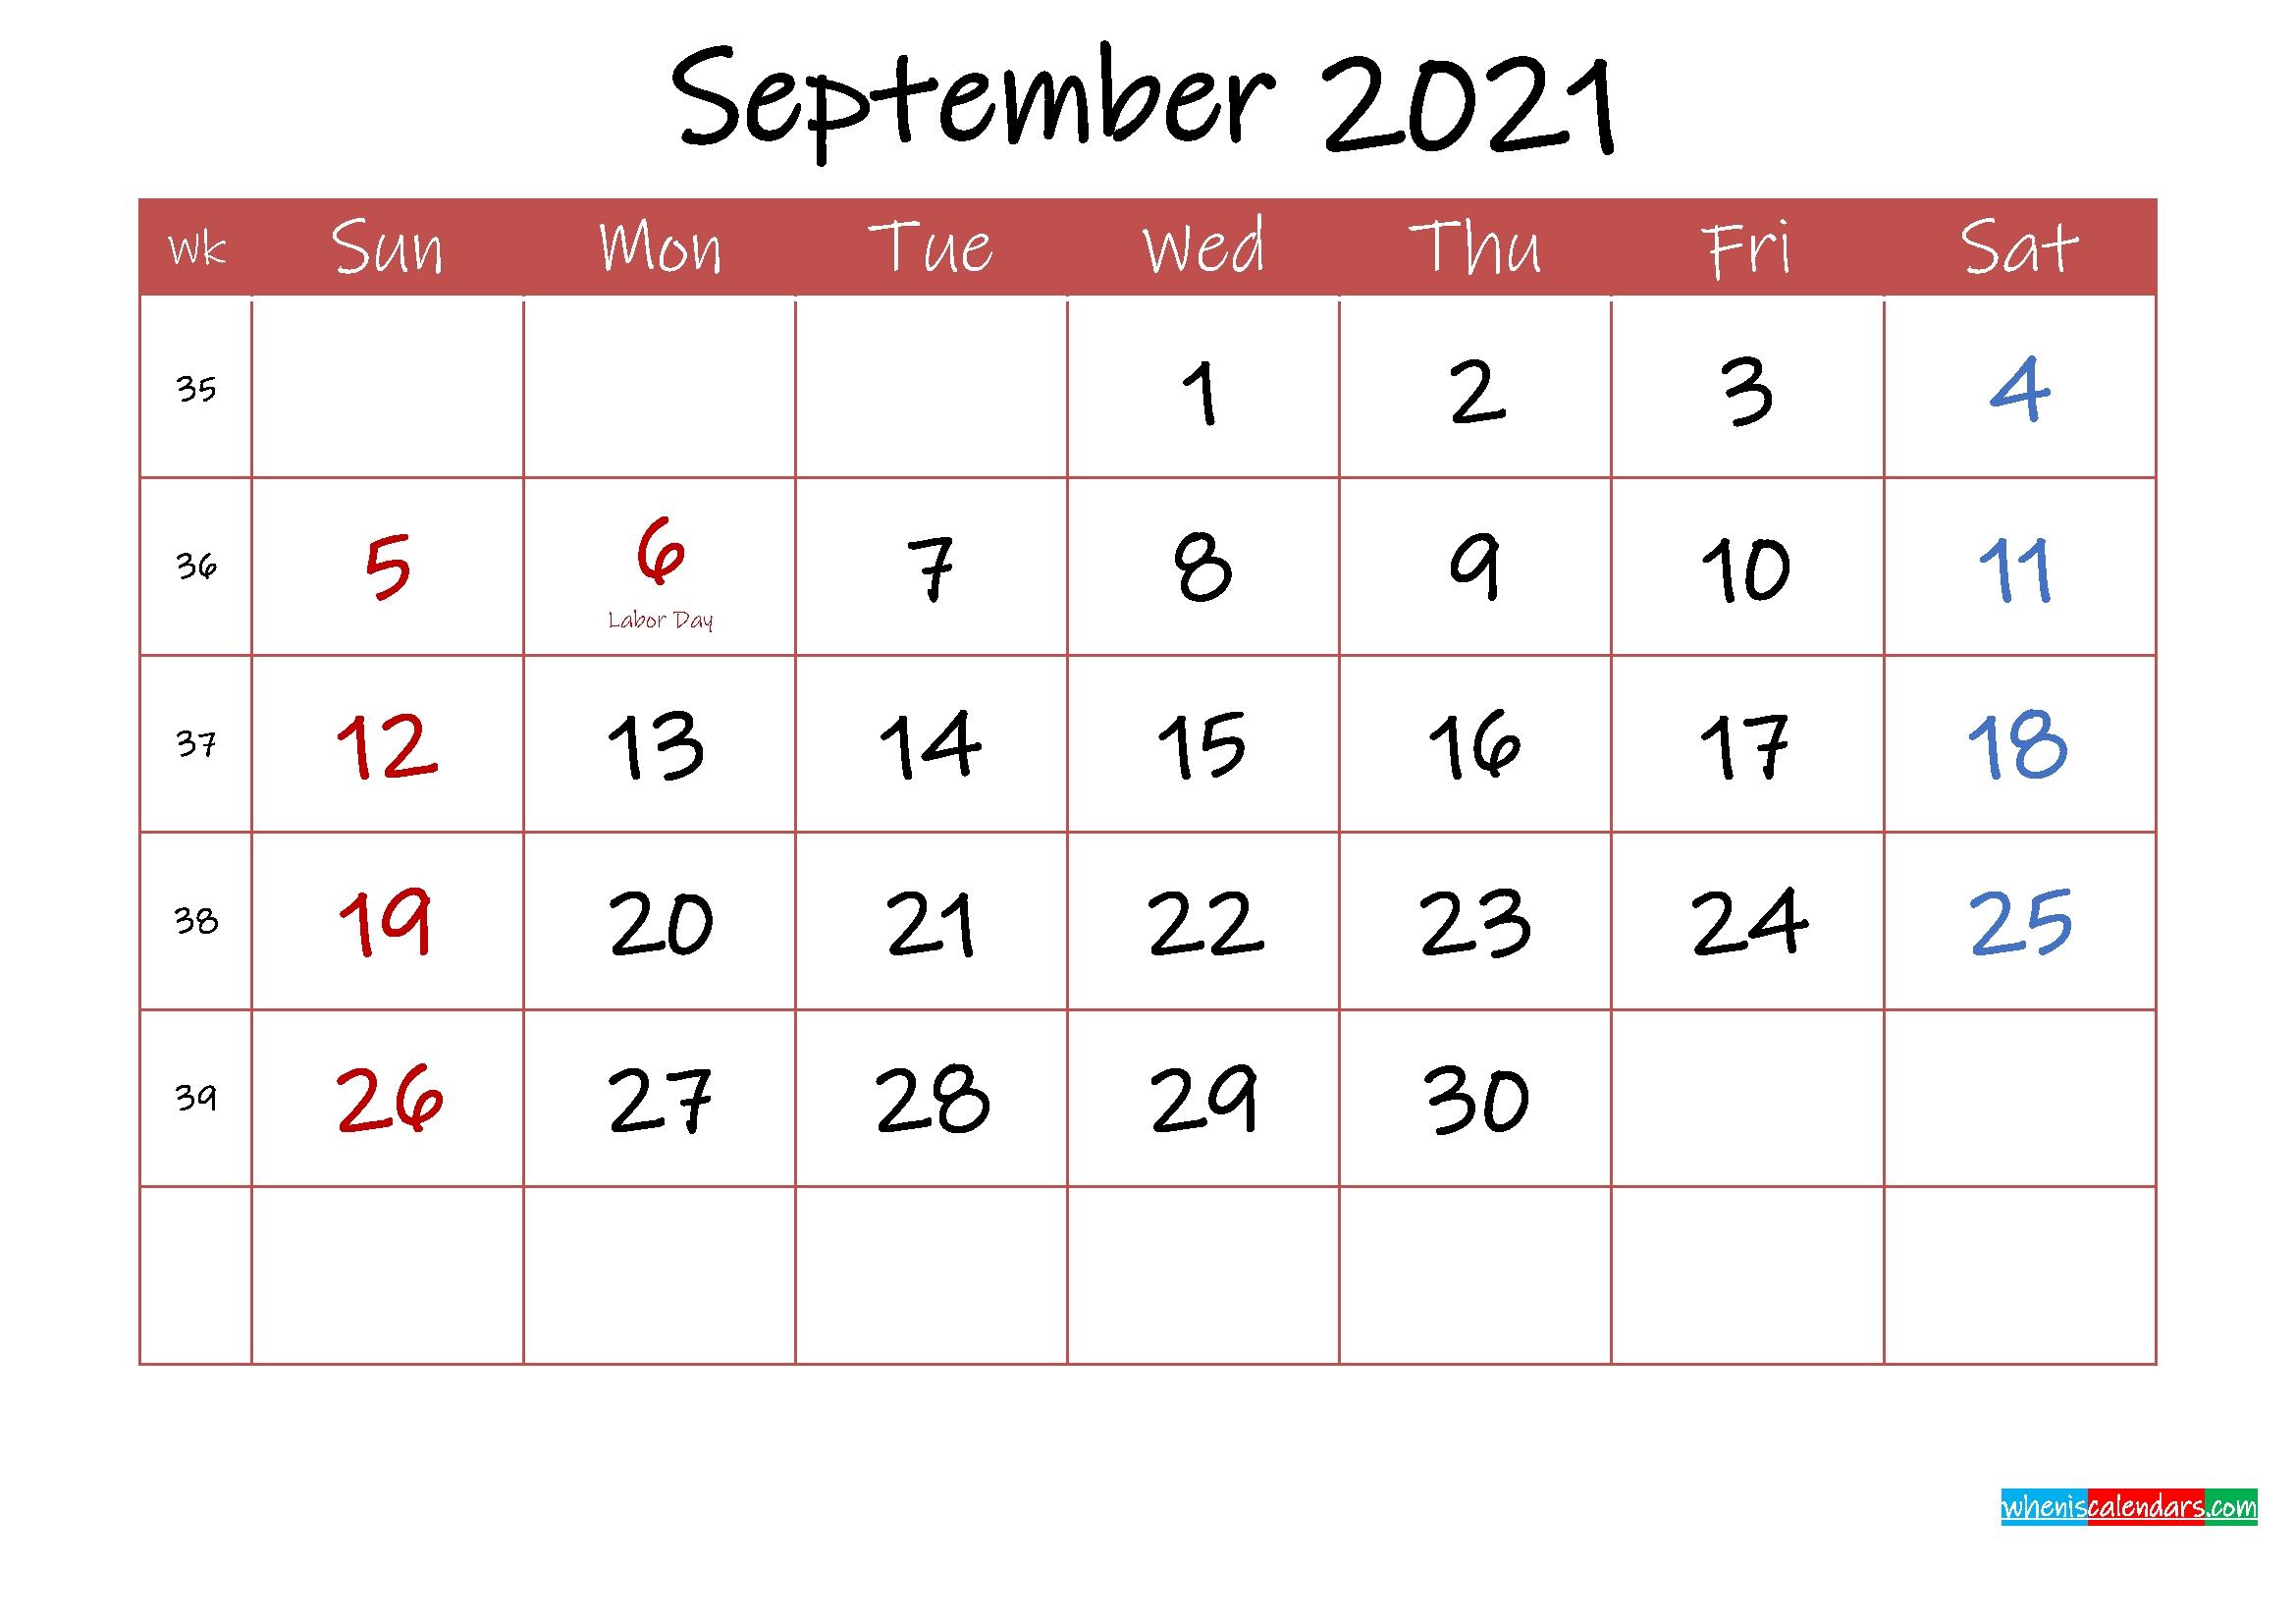 Printable September 2021 Calendar With Holidays - Template Ink21M33 - Free Printable 2021 September - December 2021 Calendar